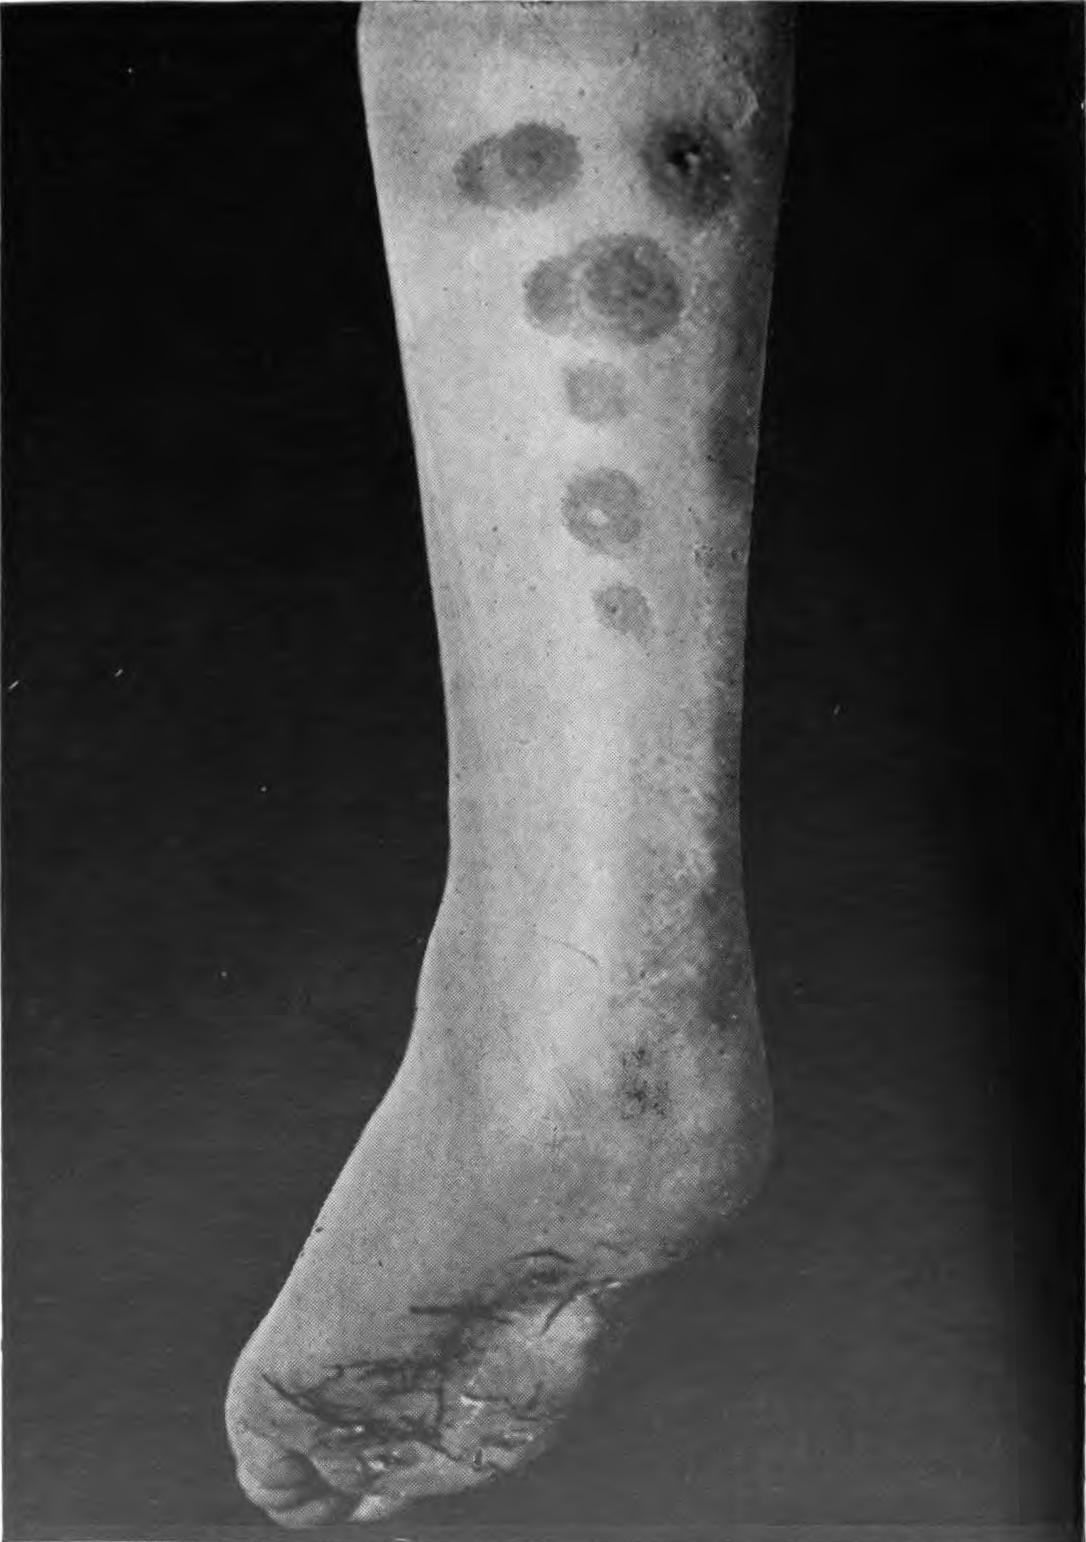 An introduction to dermatology (1905) erythema induratum 2.jpg